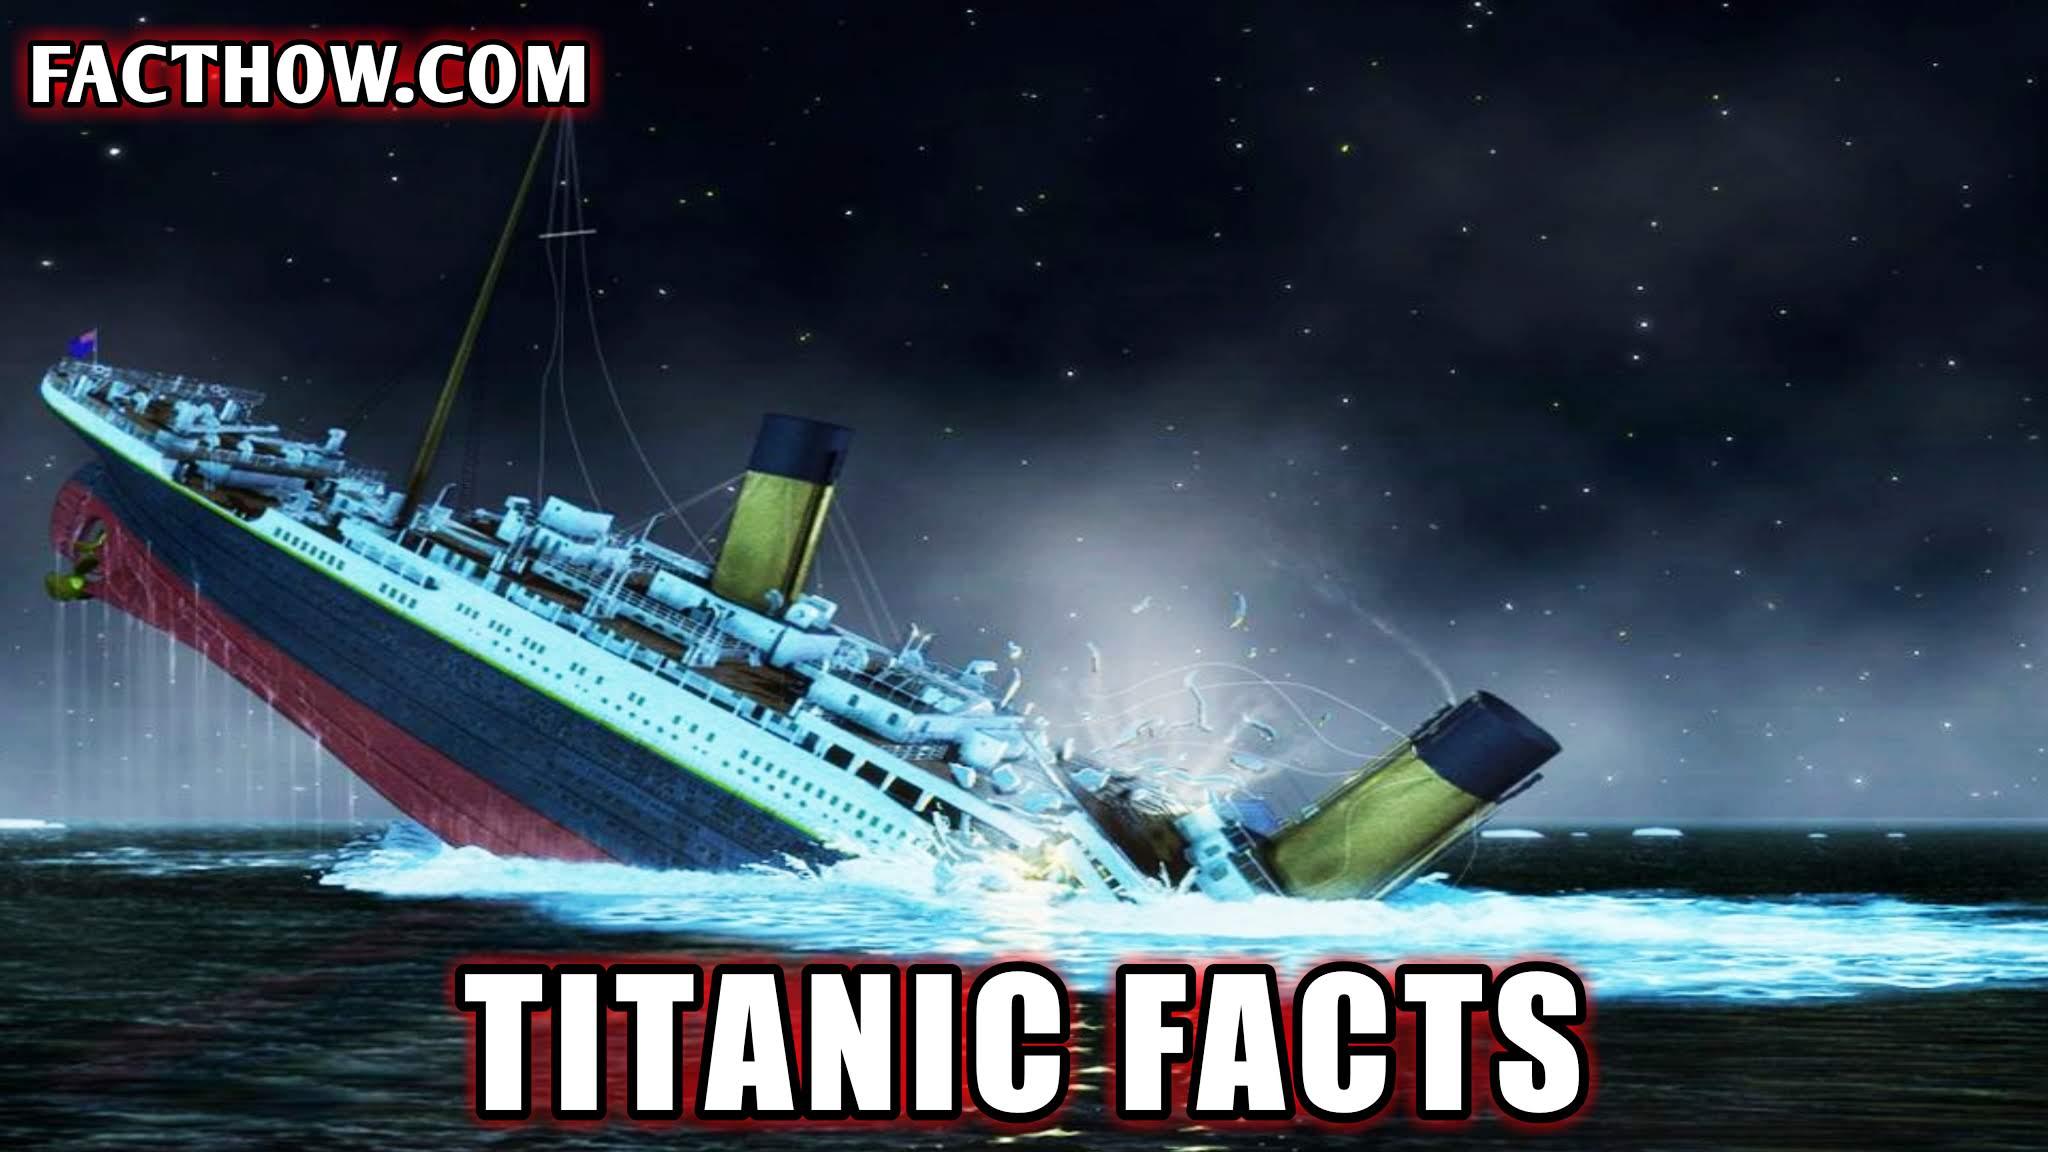 Interesting-facts-titanic-ship-titanic-movie-free-download-hd-hindi-1080p-download-openload-titanic-facts-hindi-interesting-amazing-facts-unknown-facts-hindi-titanic-facthow-fact-how-hindi-dubbed